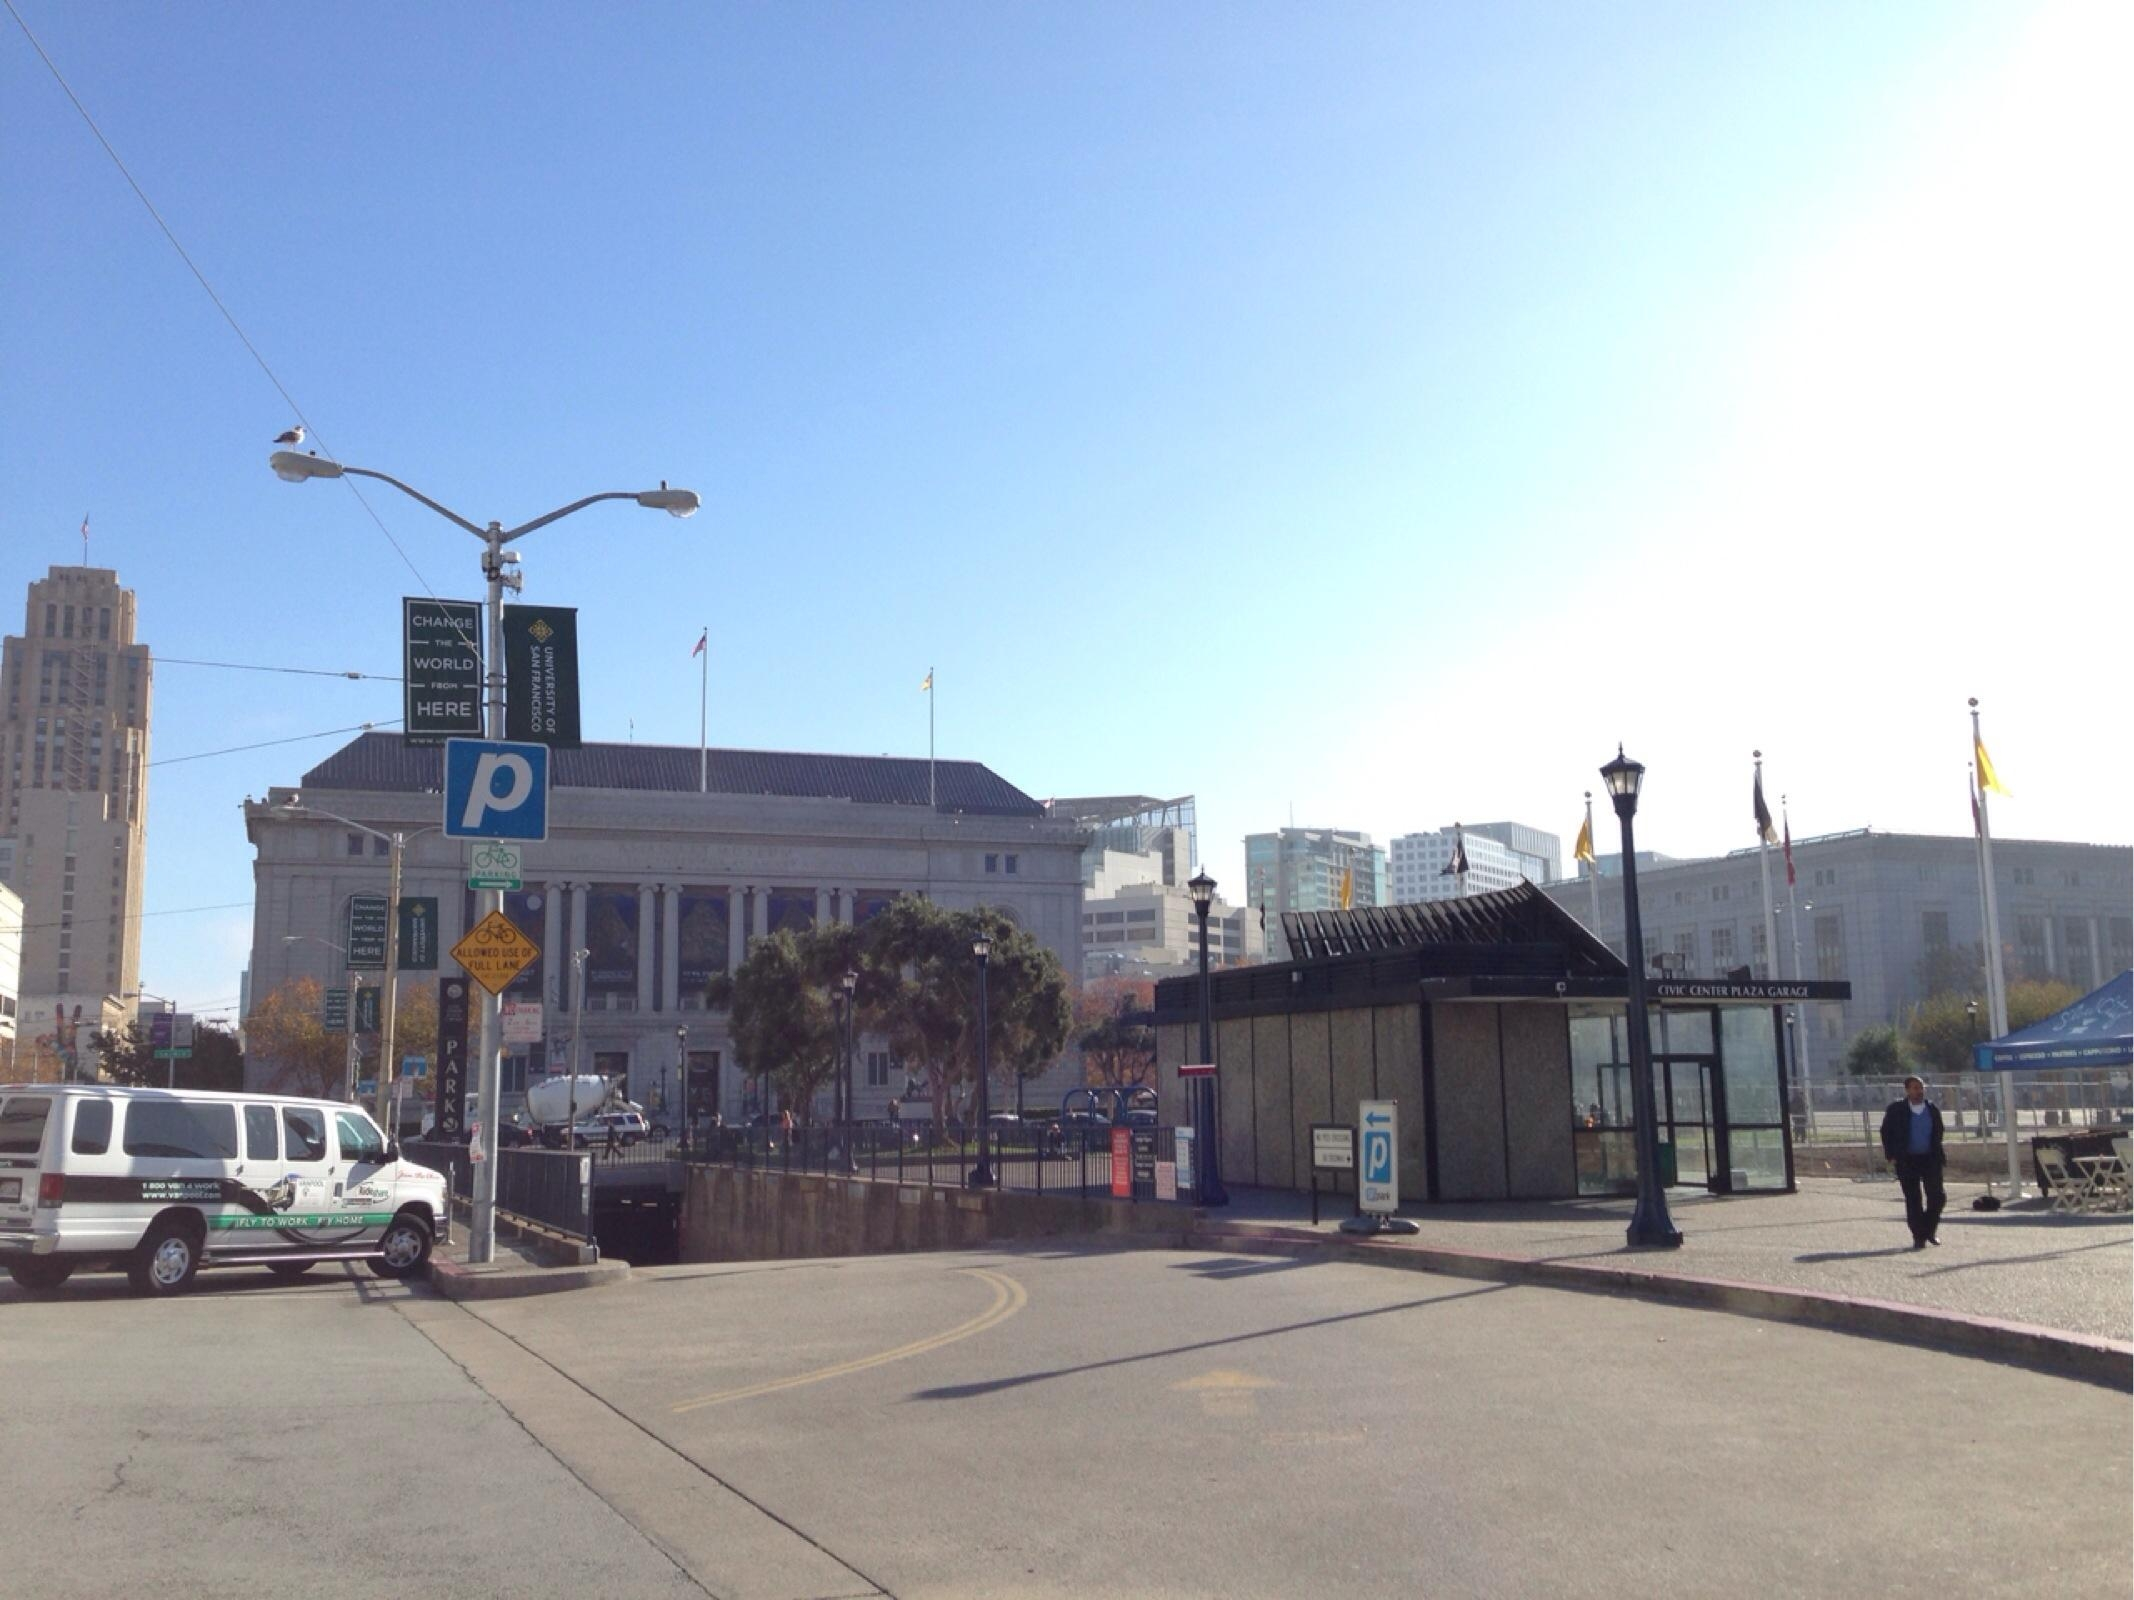 Civic Center Garage: Civic Center Garage - Parking In San Francisco